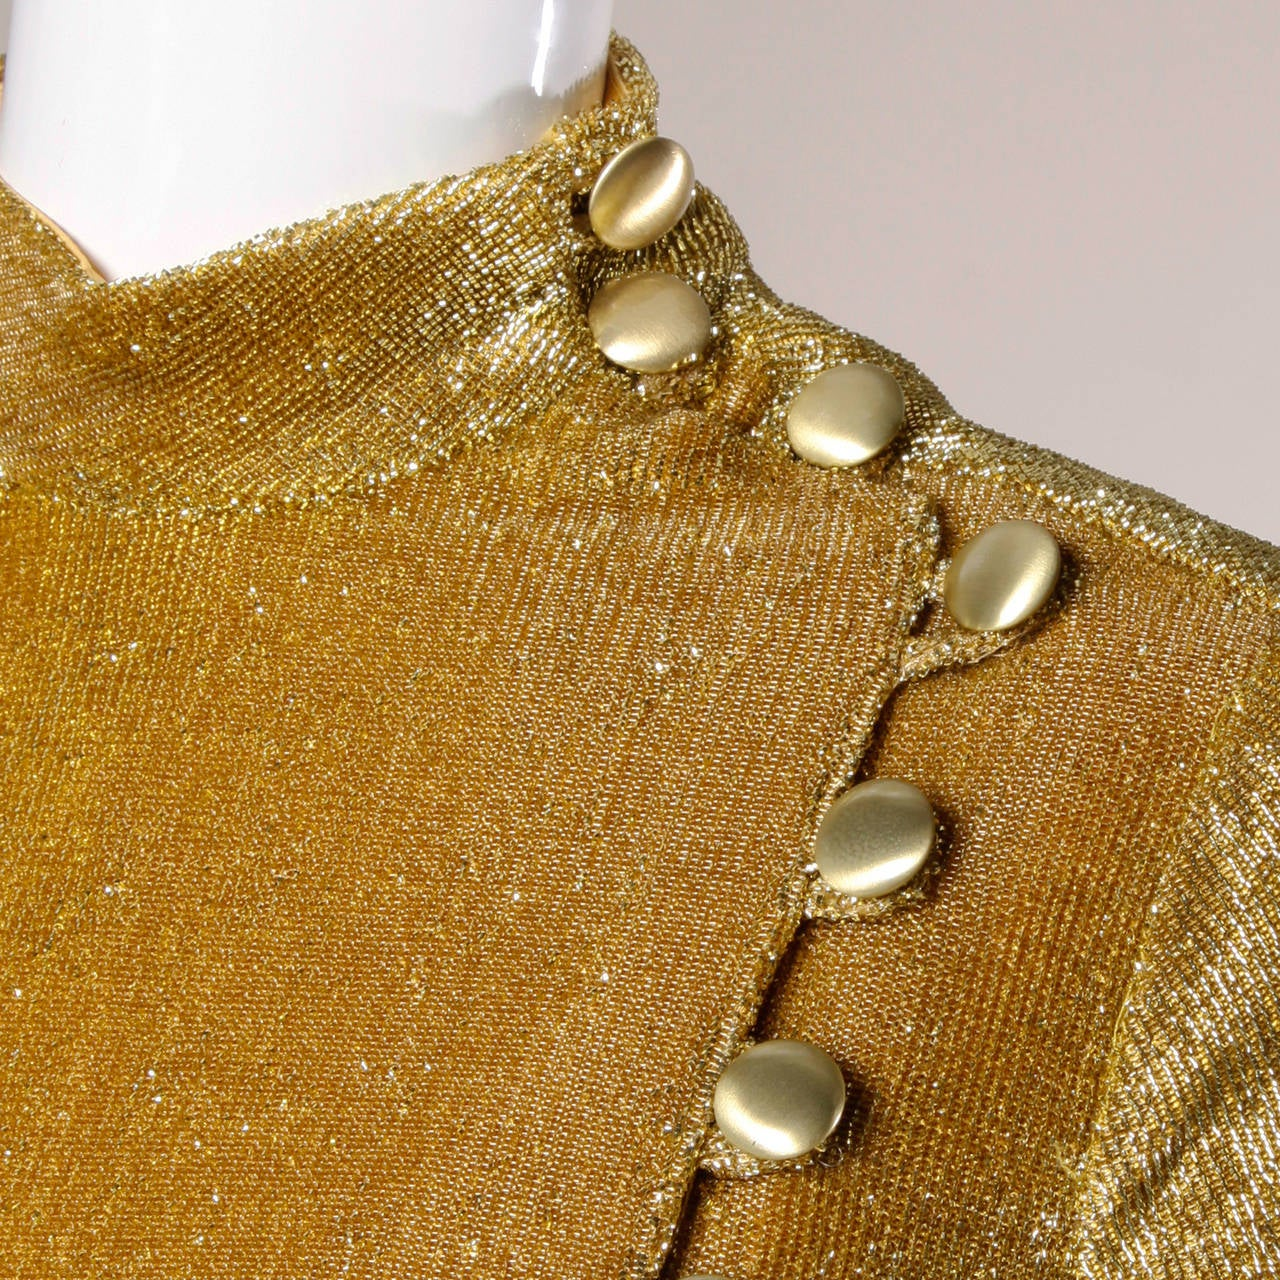 Women's Mr. Mort Vintage 1960s Metallic Gold Lurex Coat Dress For Sale